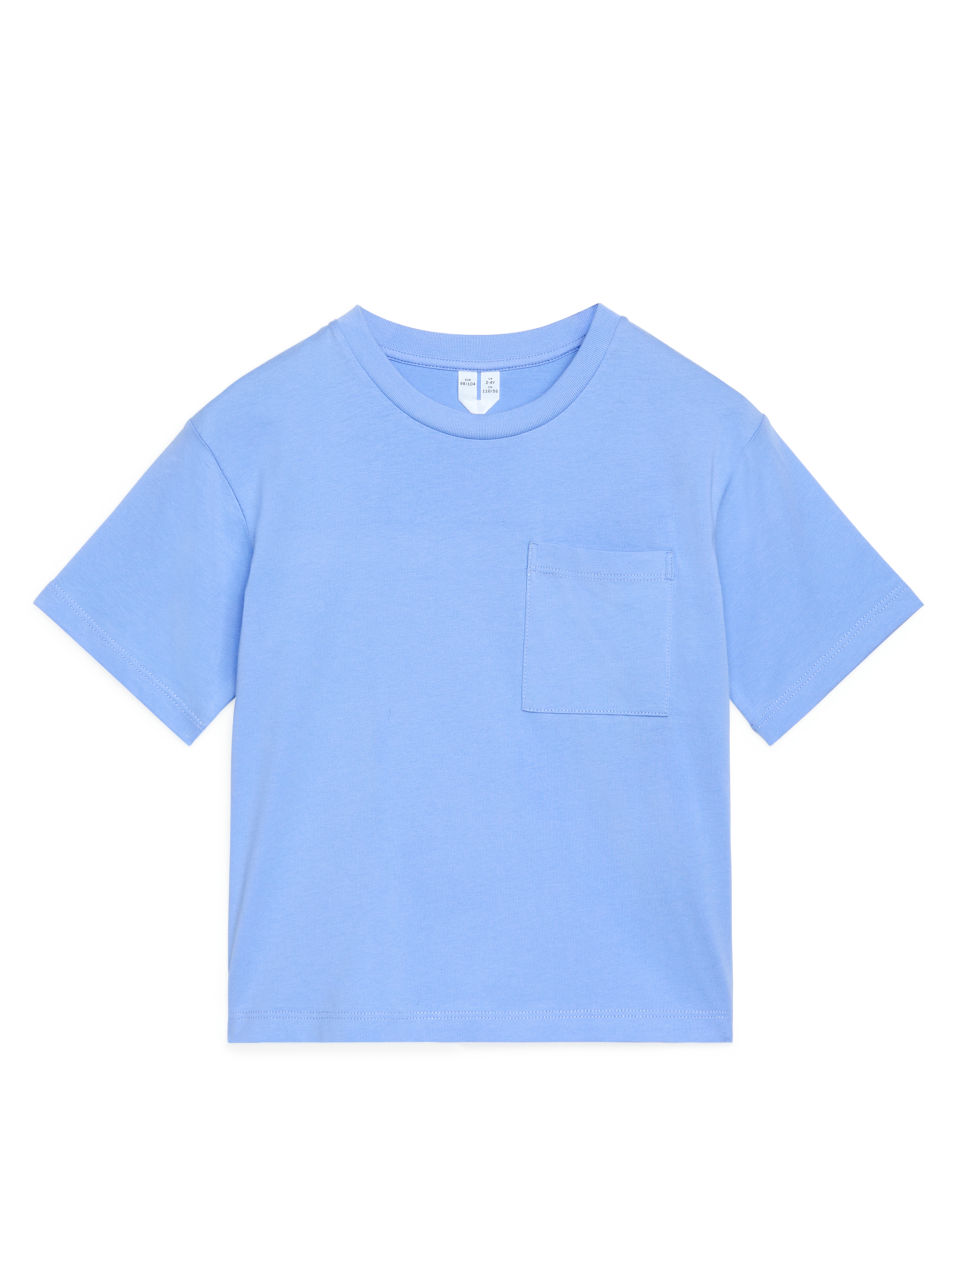 Loose Fit T-Shirt - Blue